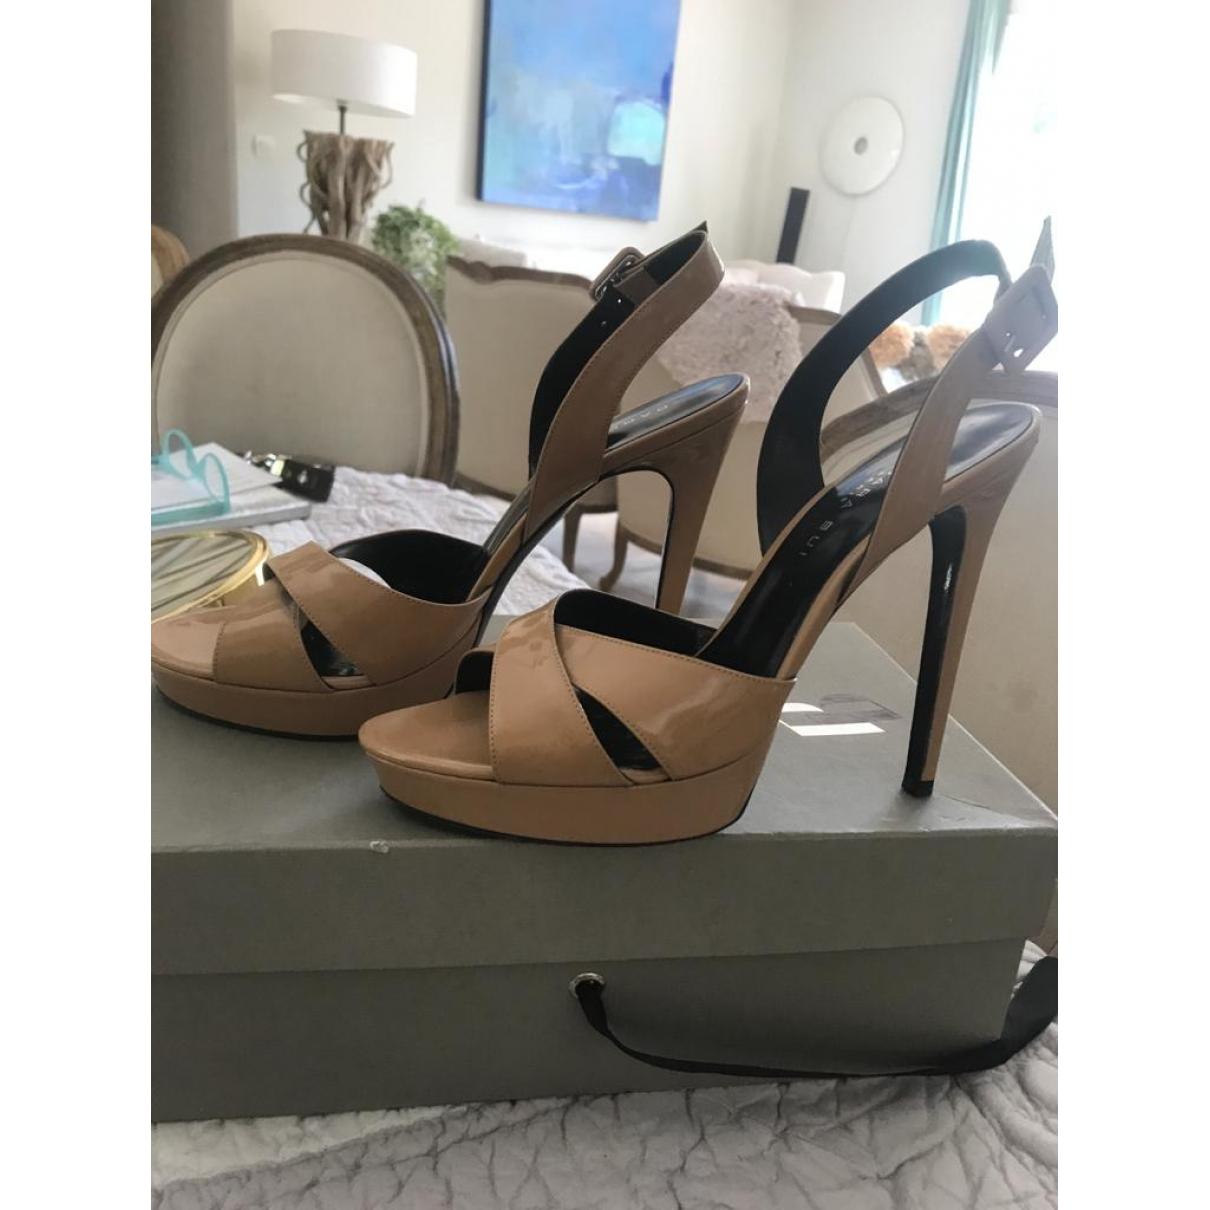 Barbara Bui \N Beige Patent leather Heels for Women 38.5 EU